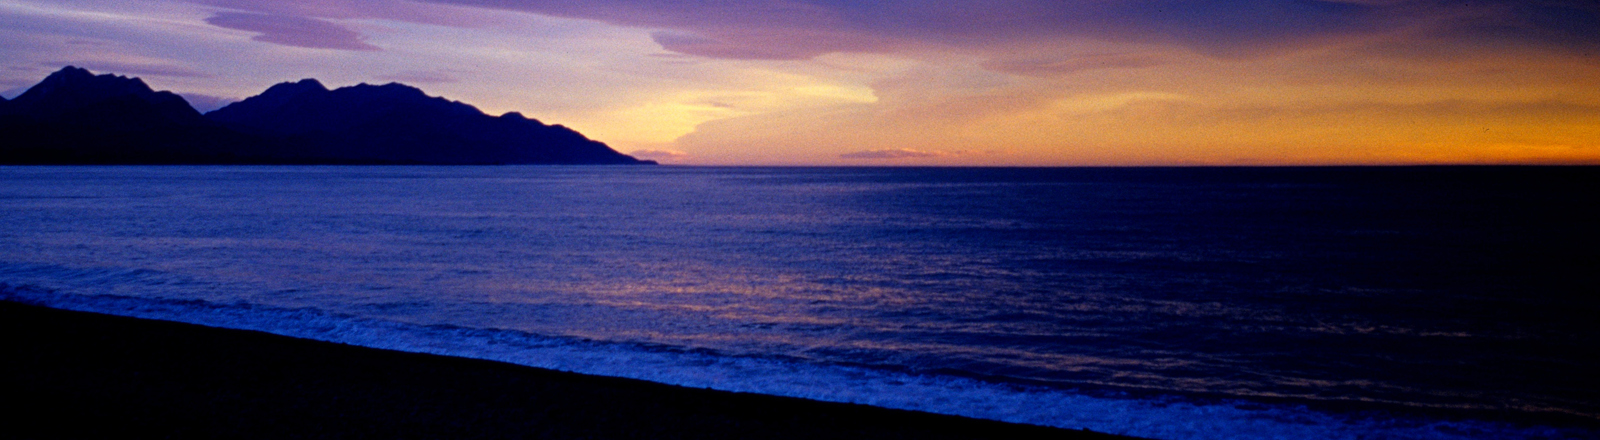 Der Pazifik bei den Osterinseln